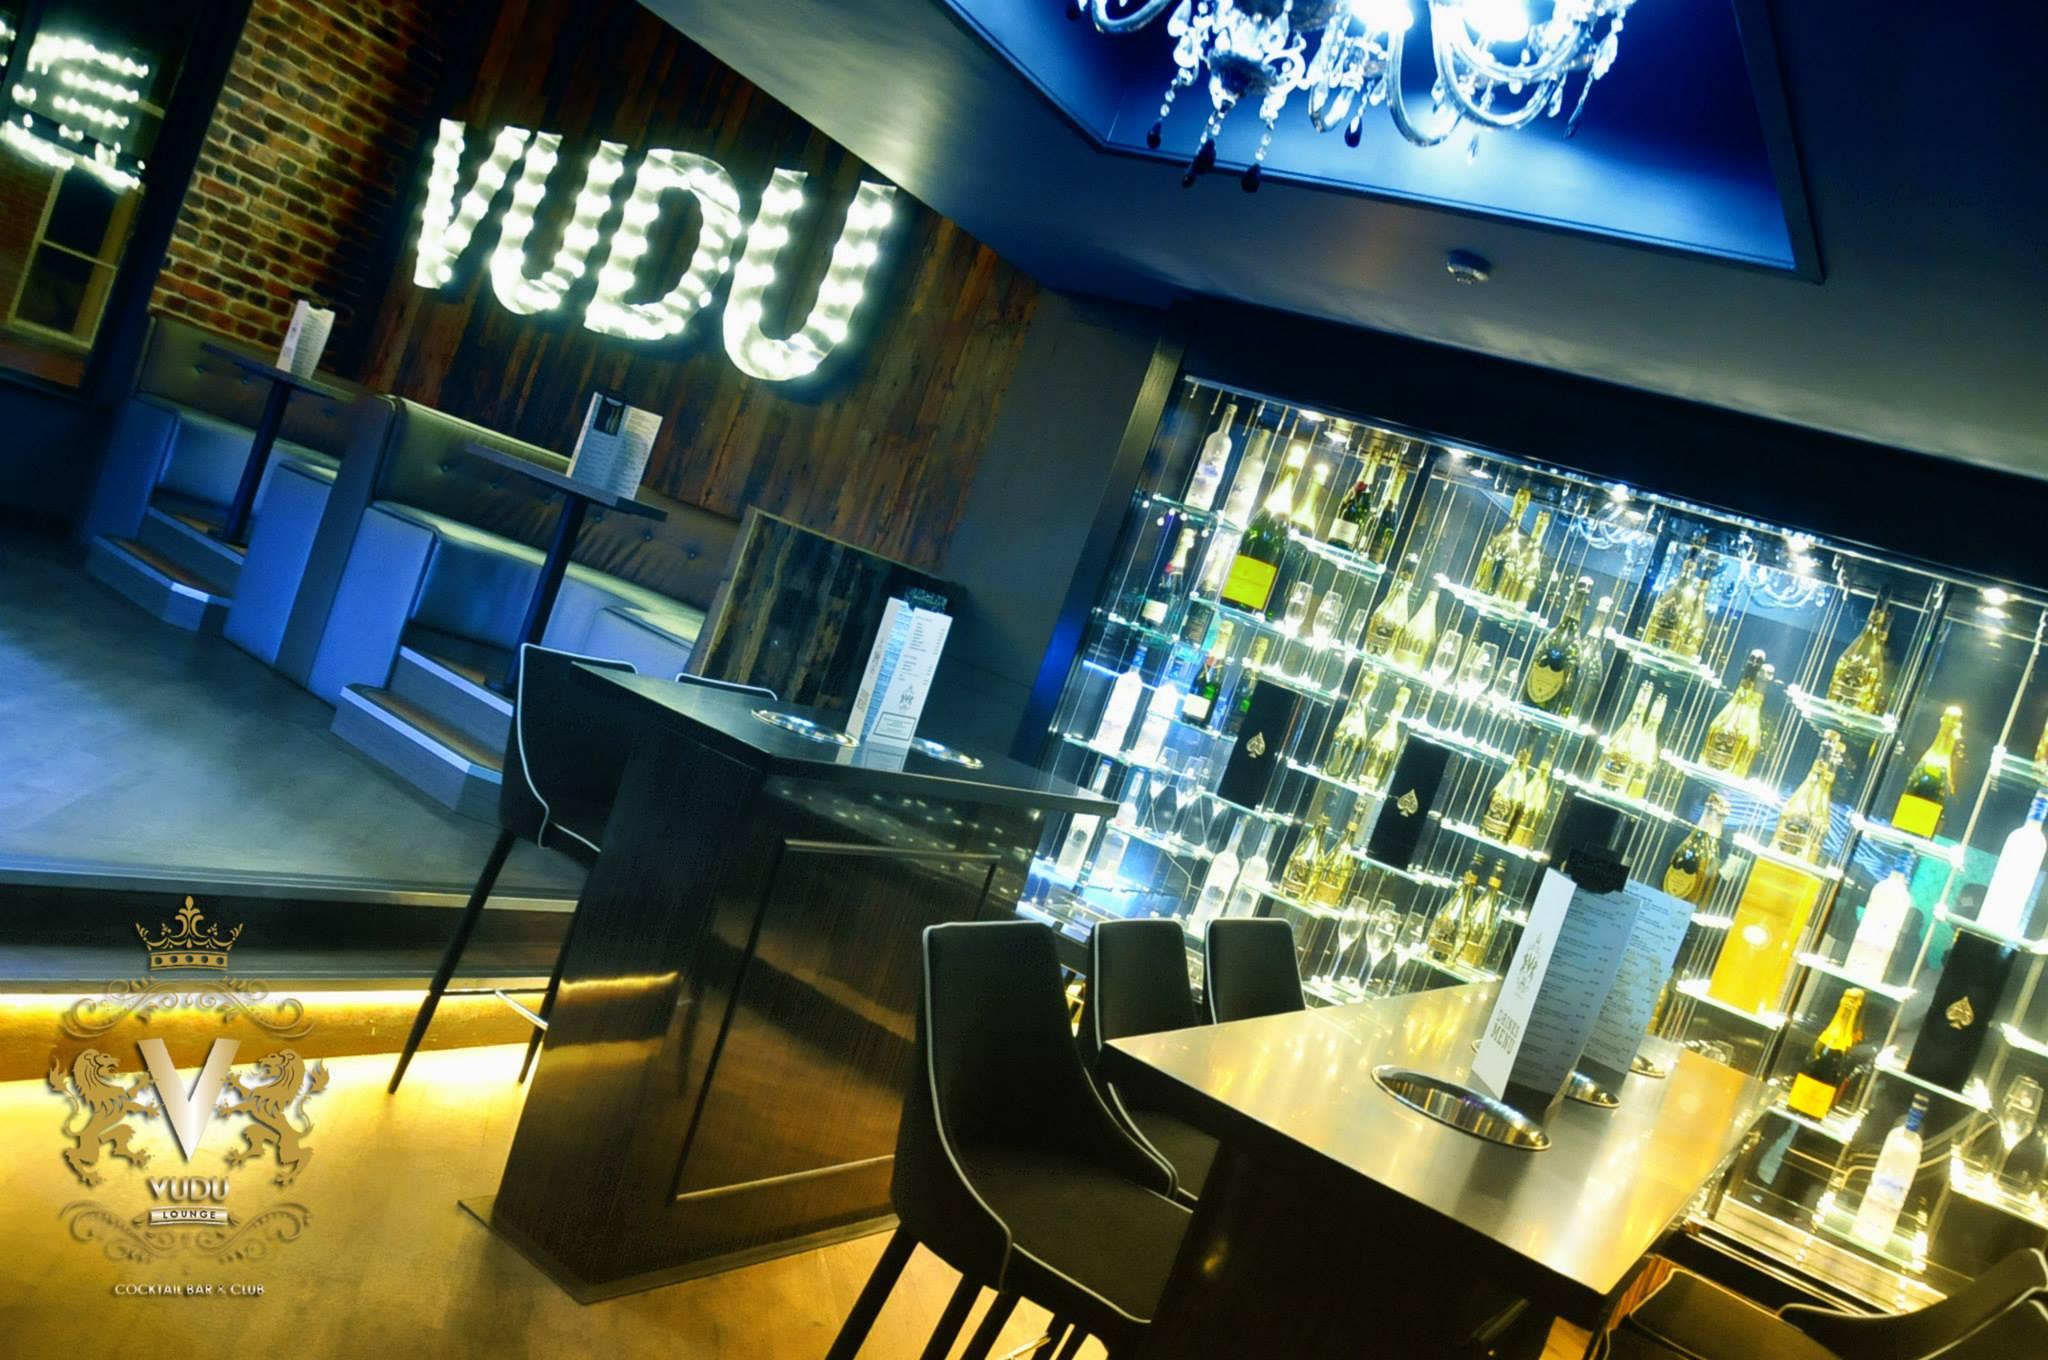 The Vudu Lounge